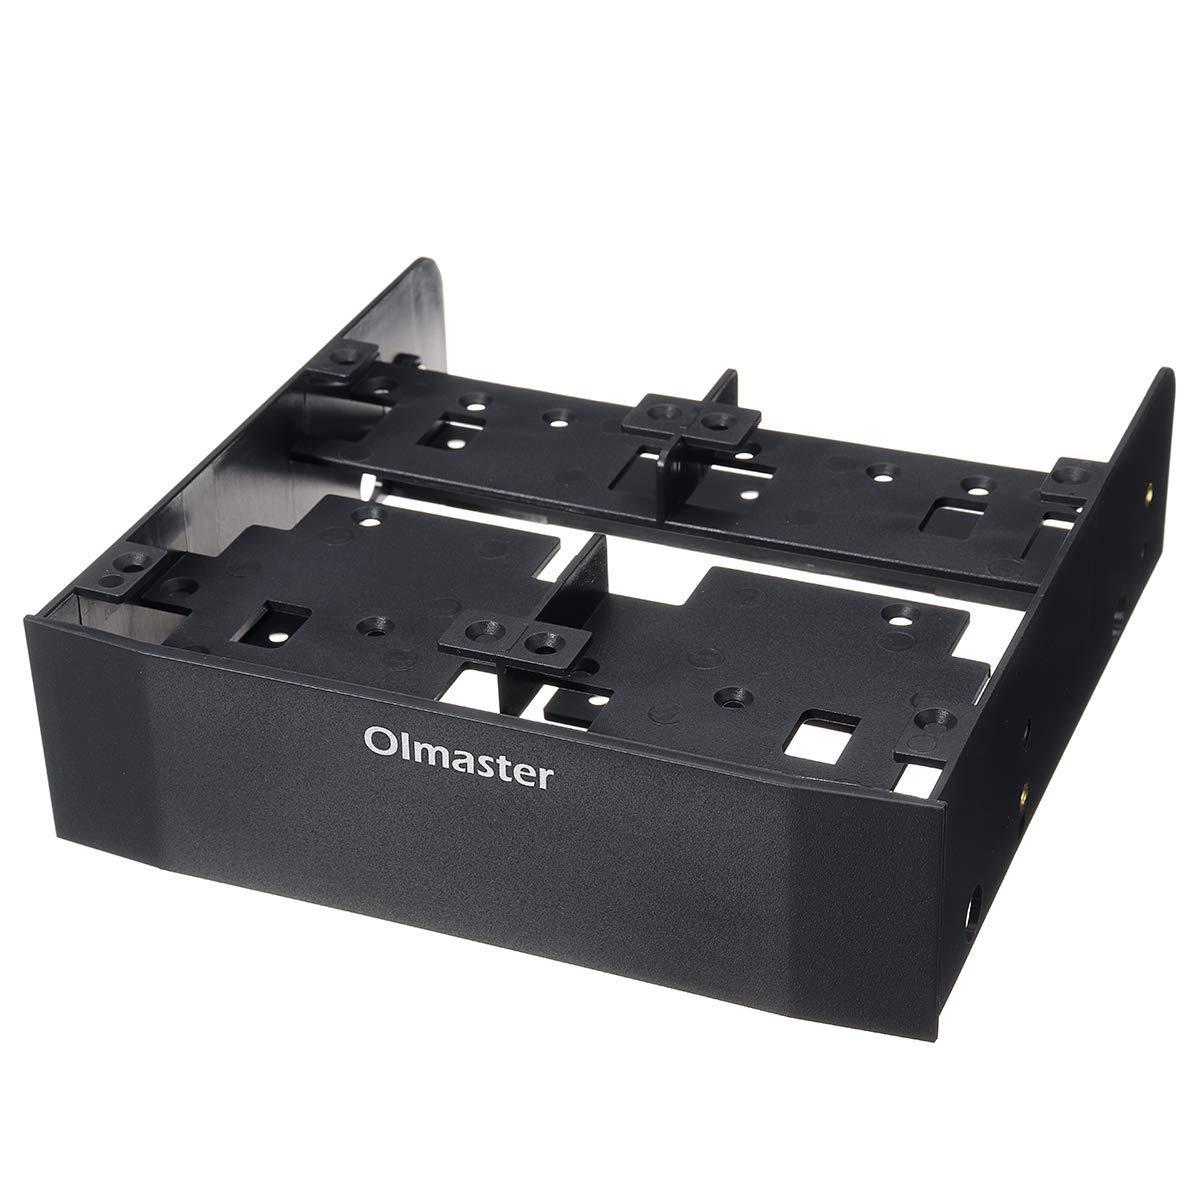 "Ochoos 5.25"" to 3.5"" Optical Drive Bay HDD Hard Drive Mounting Bracket Converter"